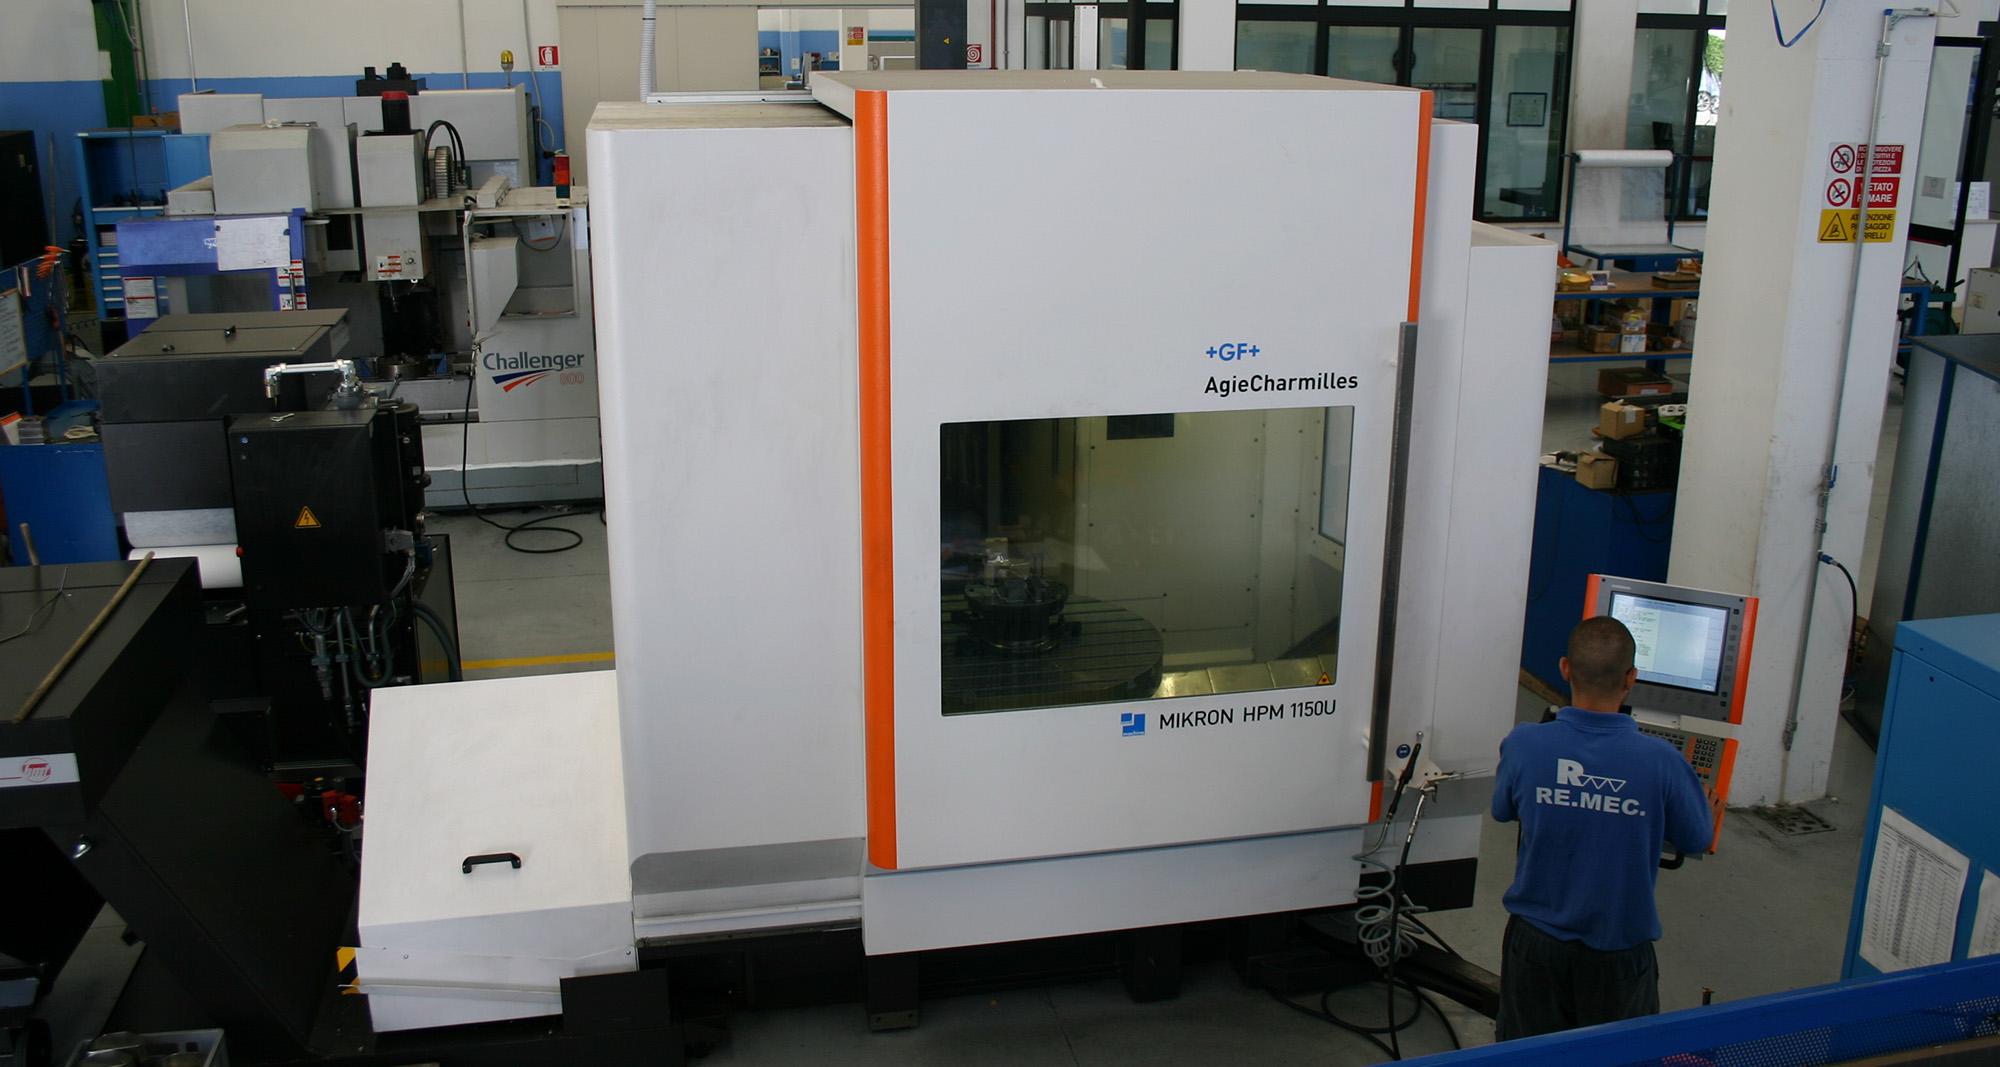 Mikron HPM 1150U Mandrino ISO 40 - Remec